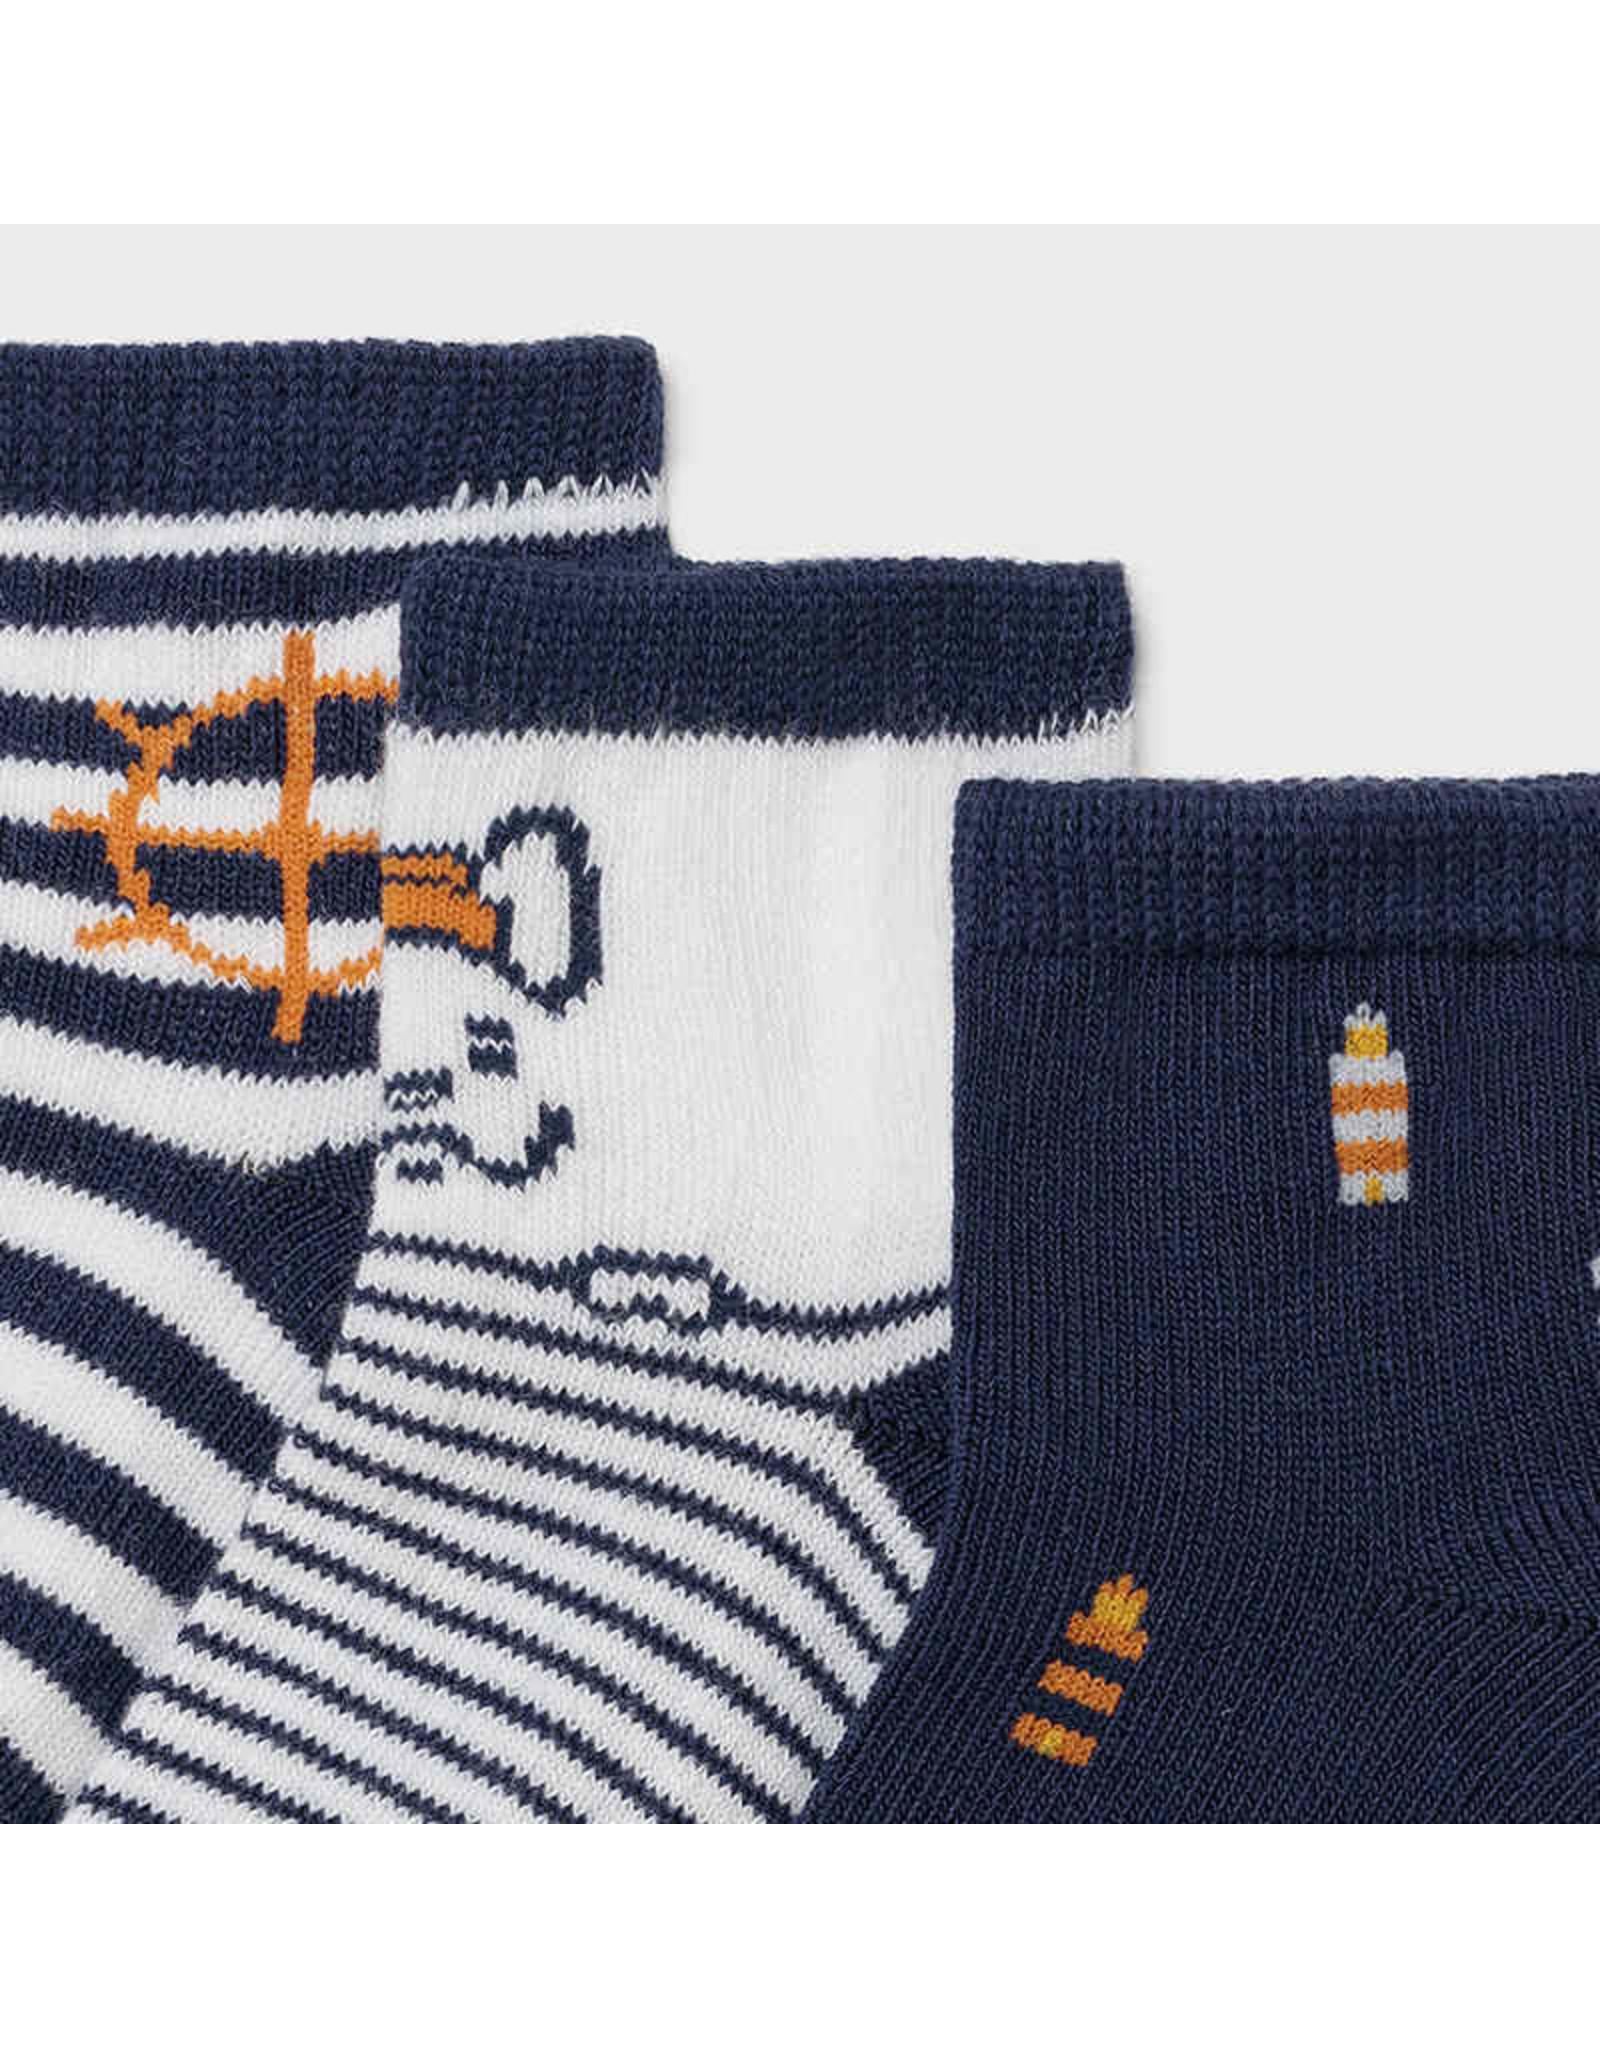 Mayoral 3 socks set - Nautical